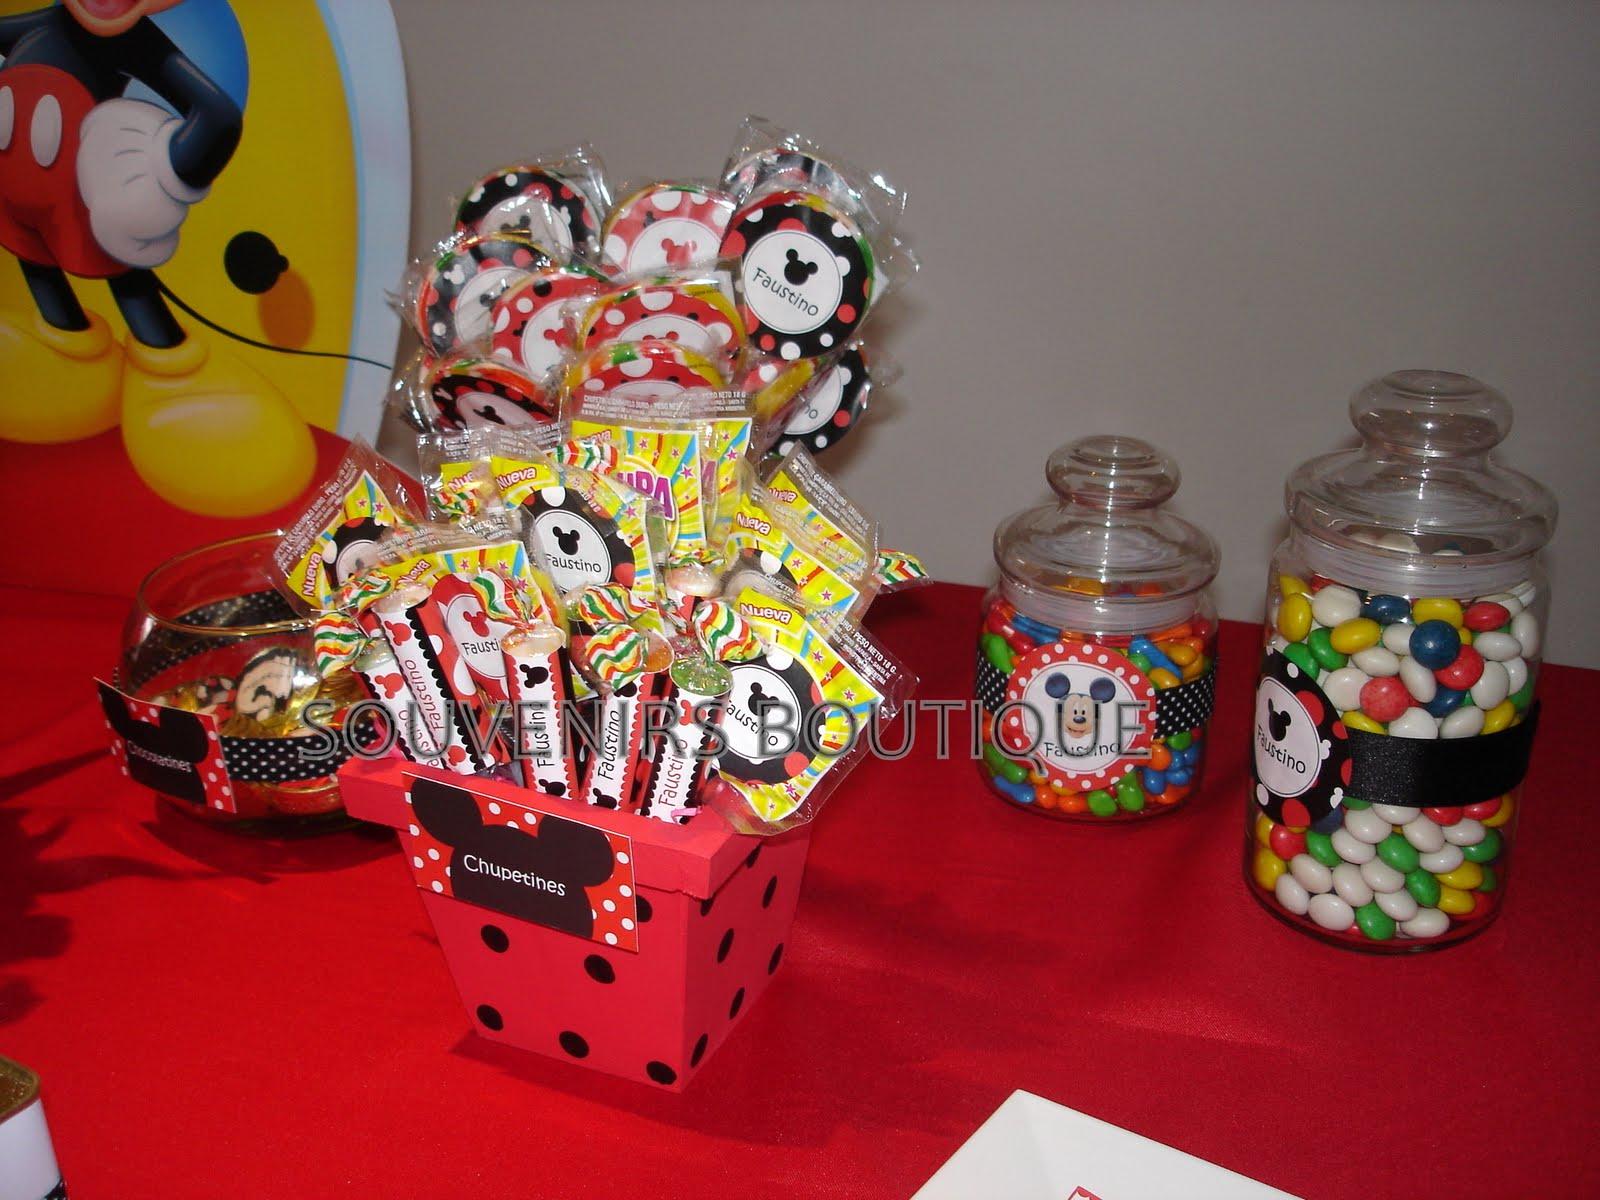 Souvenirs Boutique: Festejo tematico de Mickey Mouse para Faustino!!